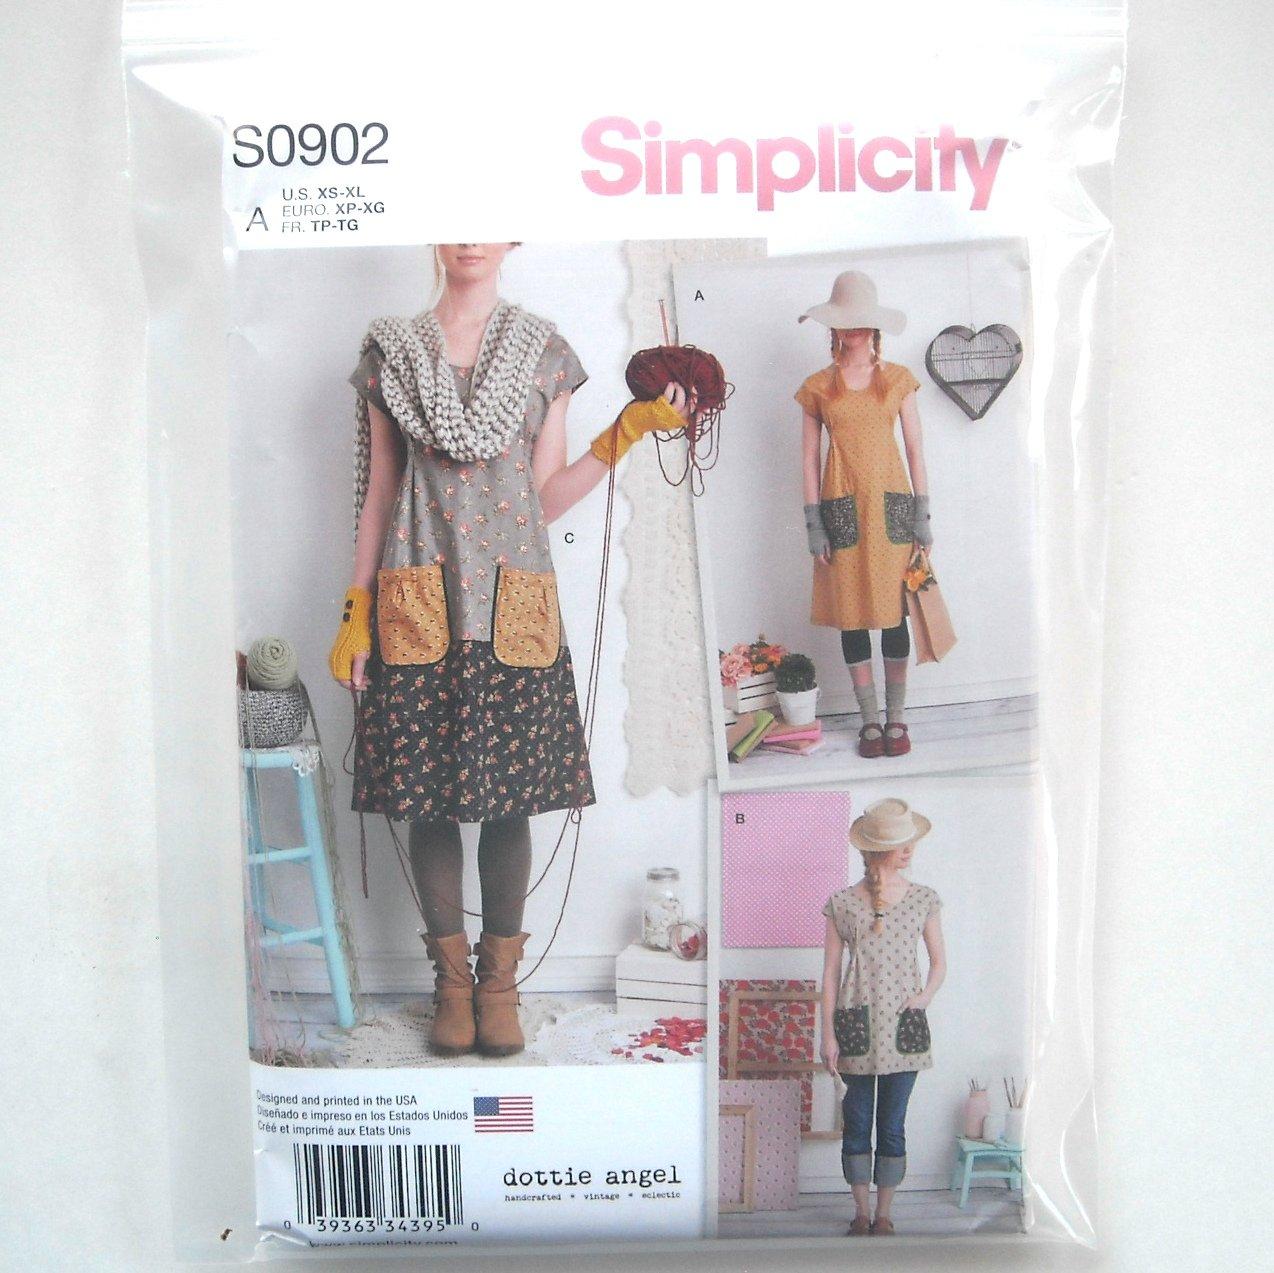 Misses Dress Tunic XS S M L XL Dottie Angel Simplicity Sewing Pattern S0902